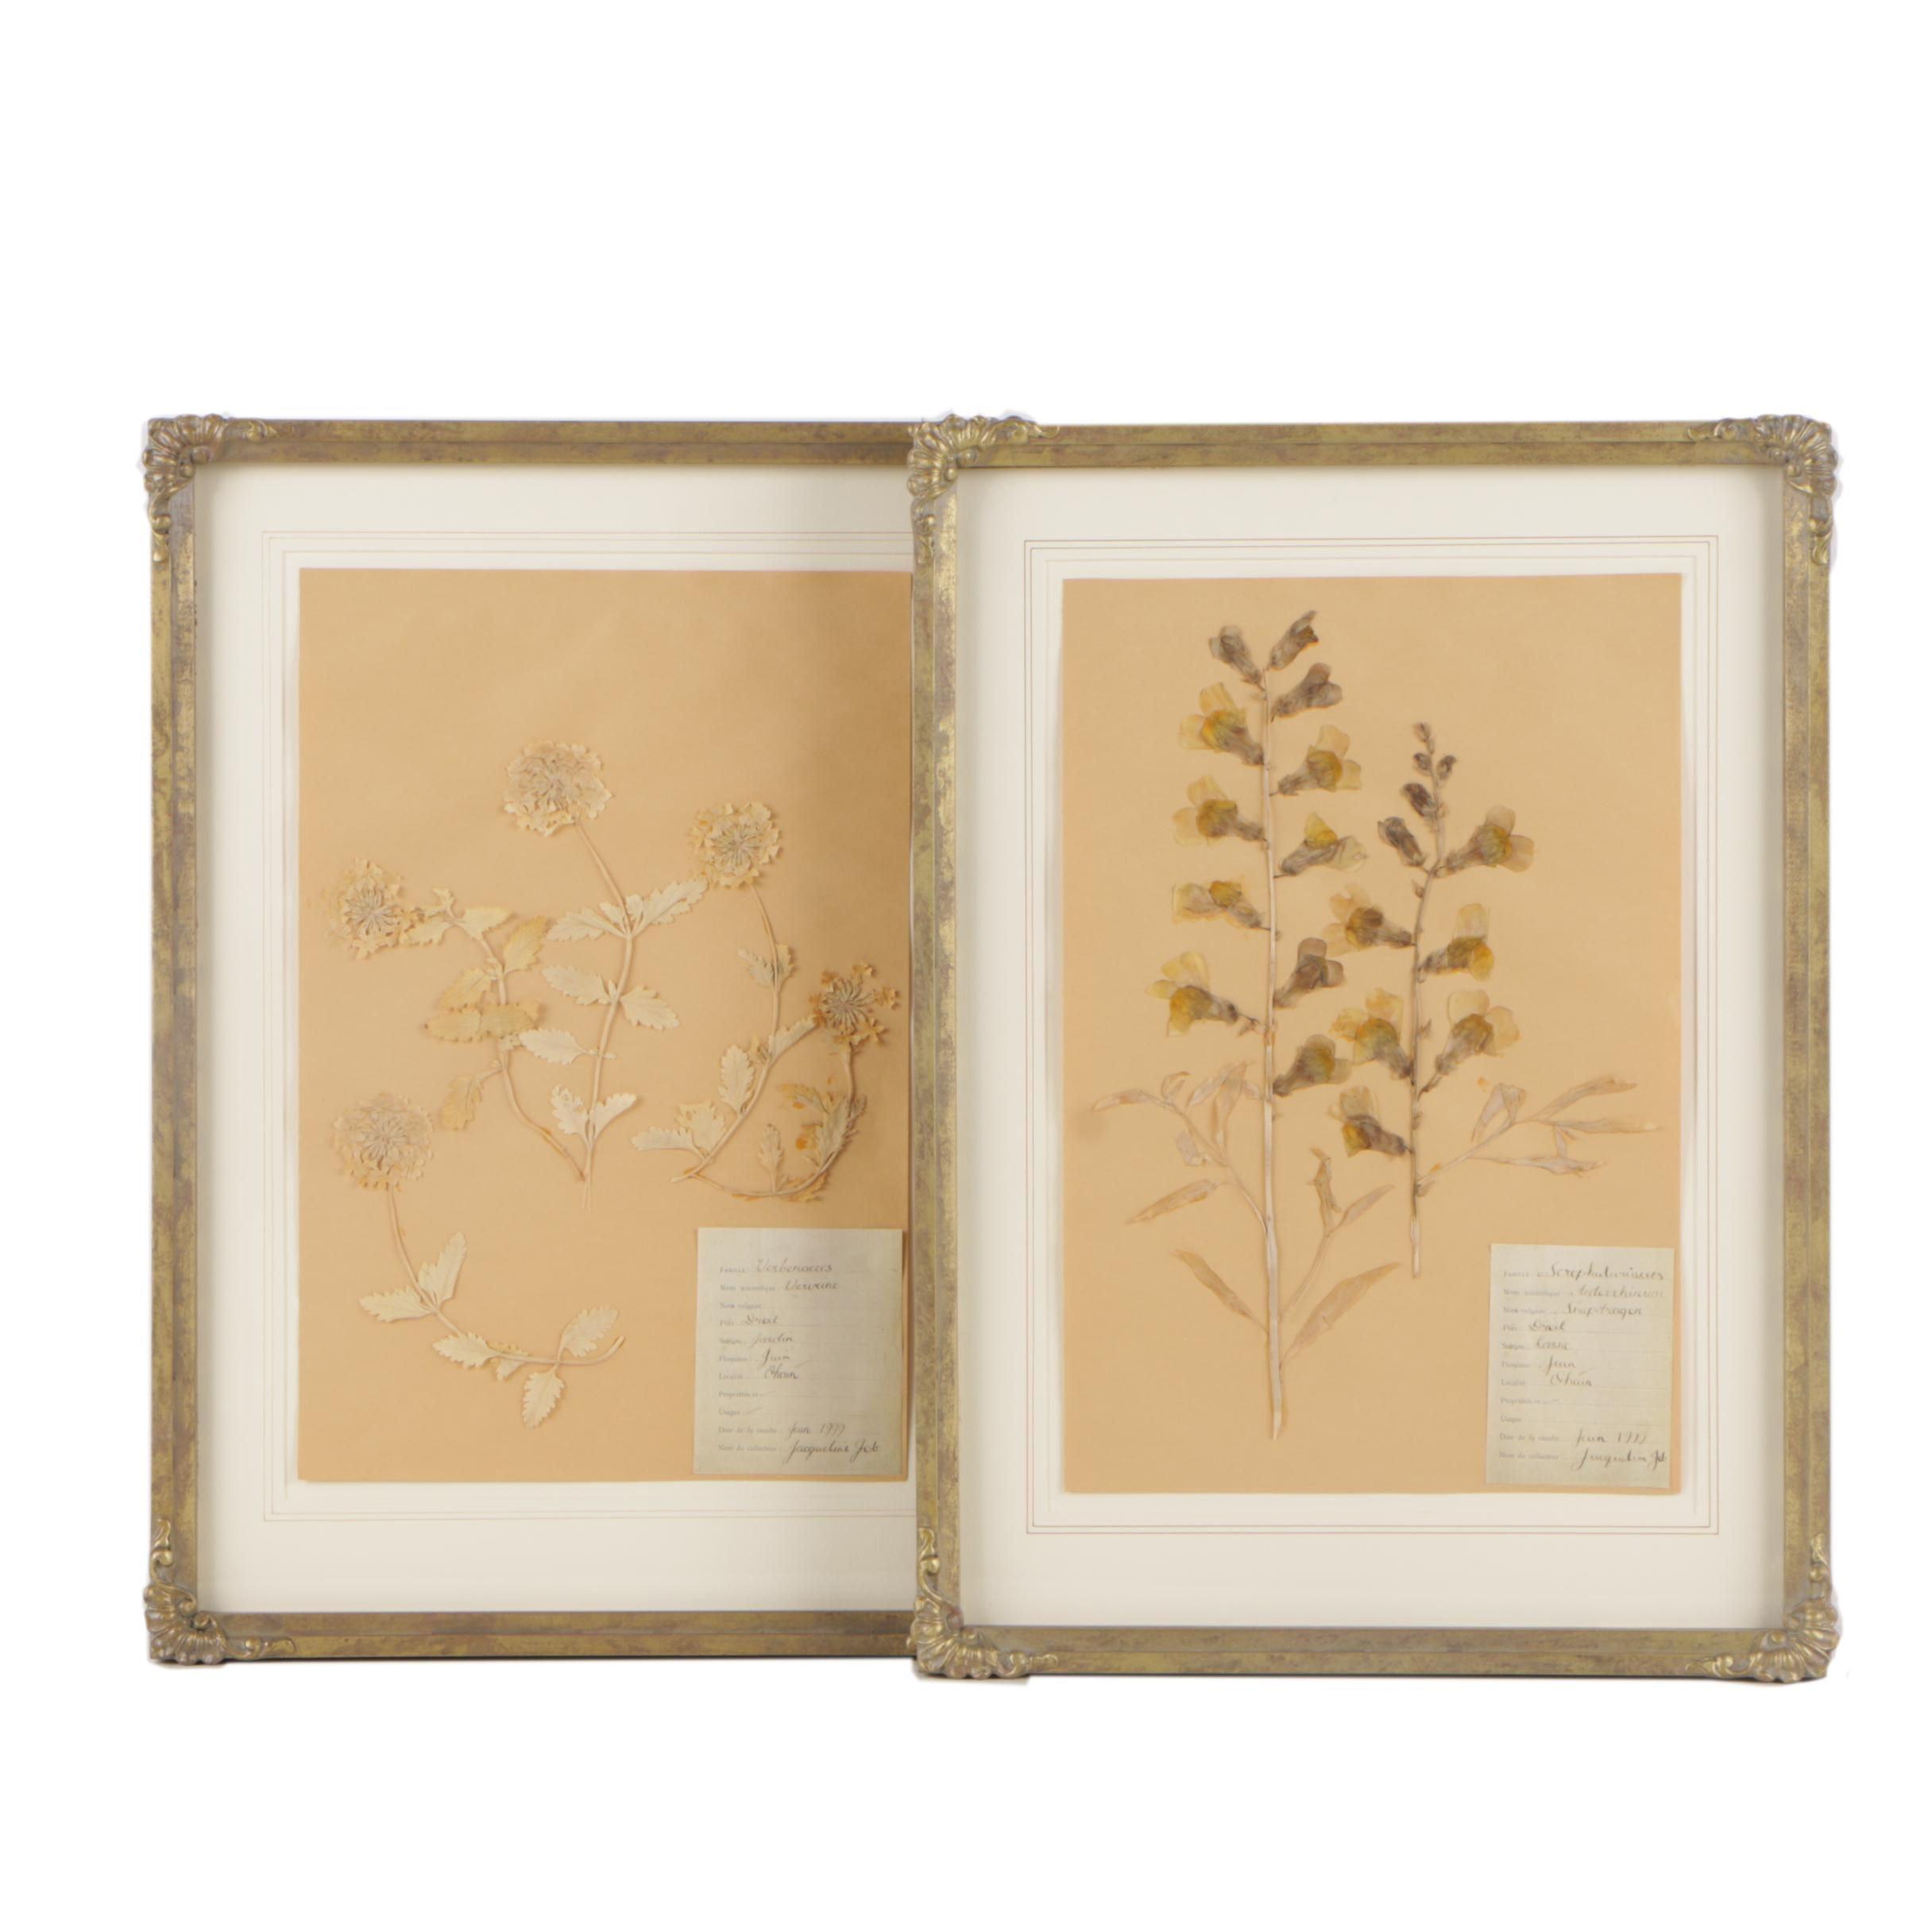 Framed Displays of Pressed Herbarium Specimens